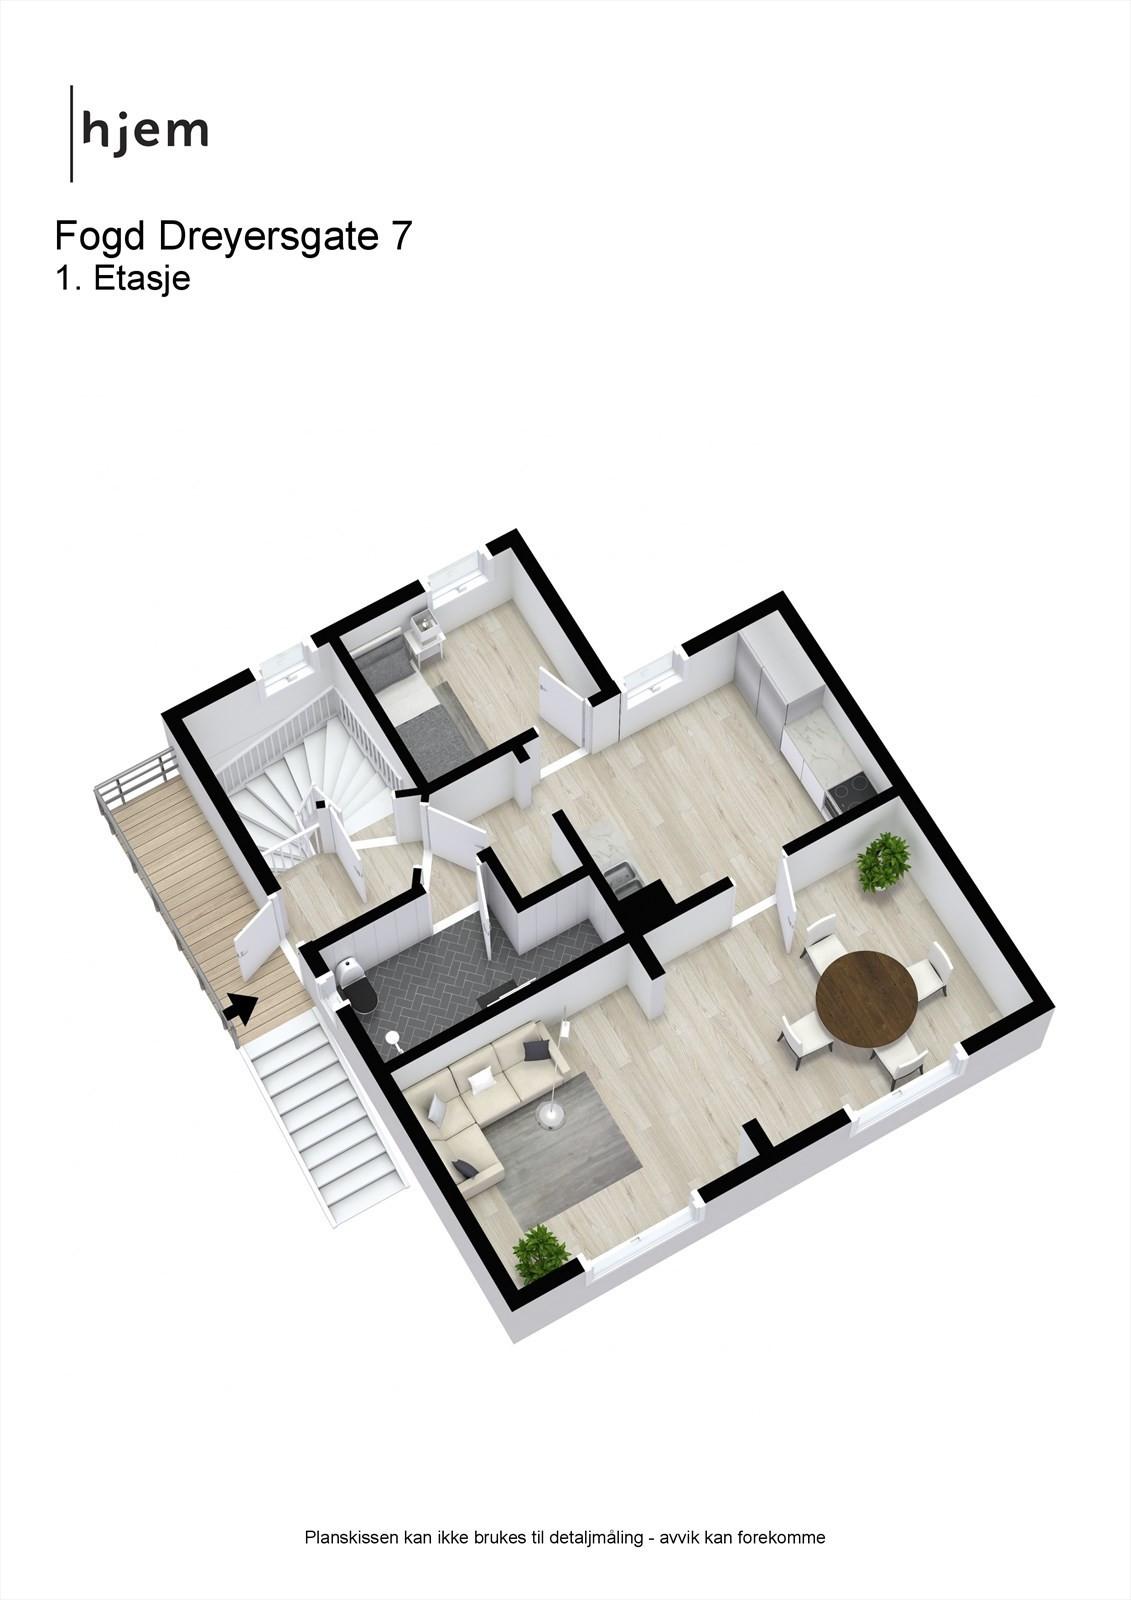 Fogd Dreyersgate 7 - 3D - 1. Etasje